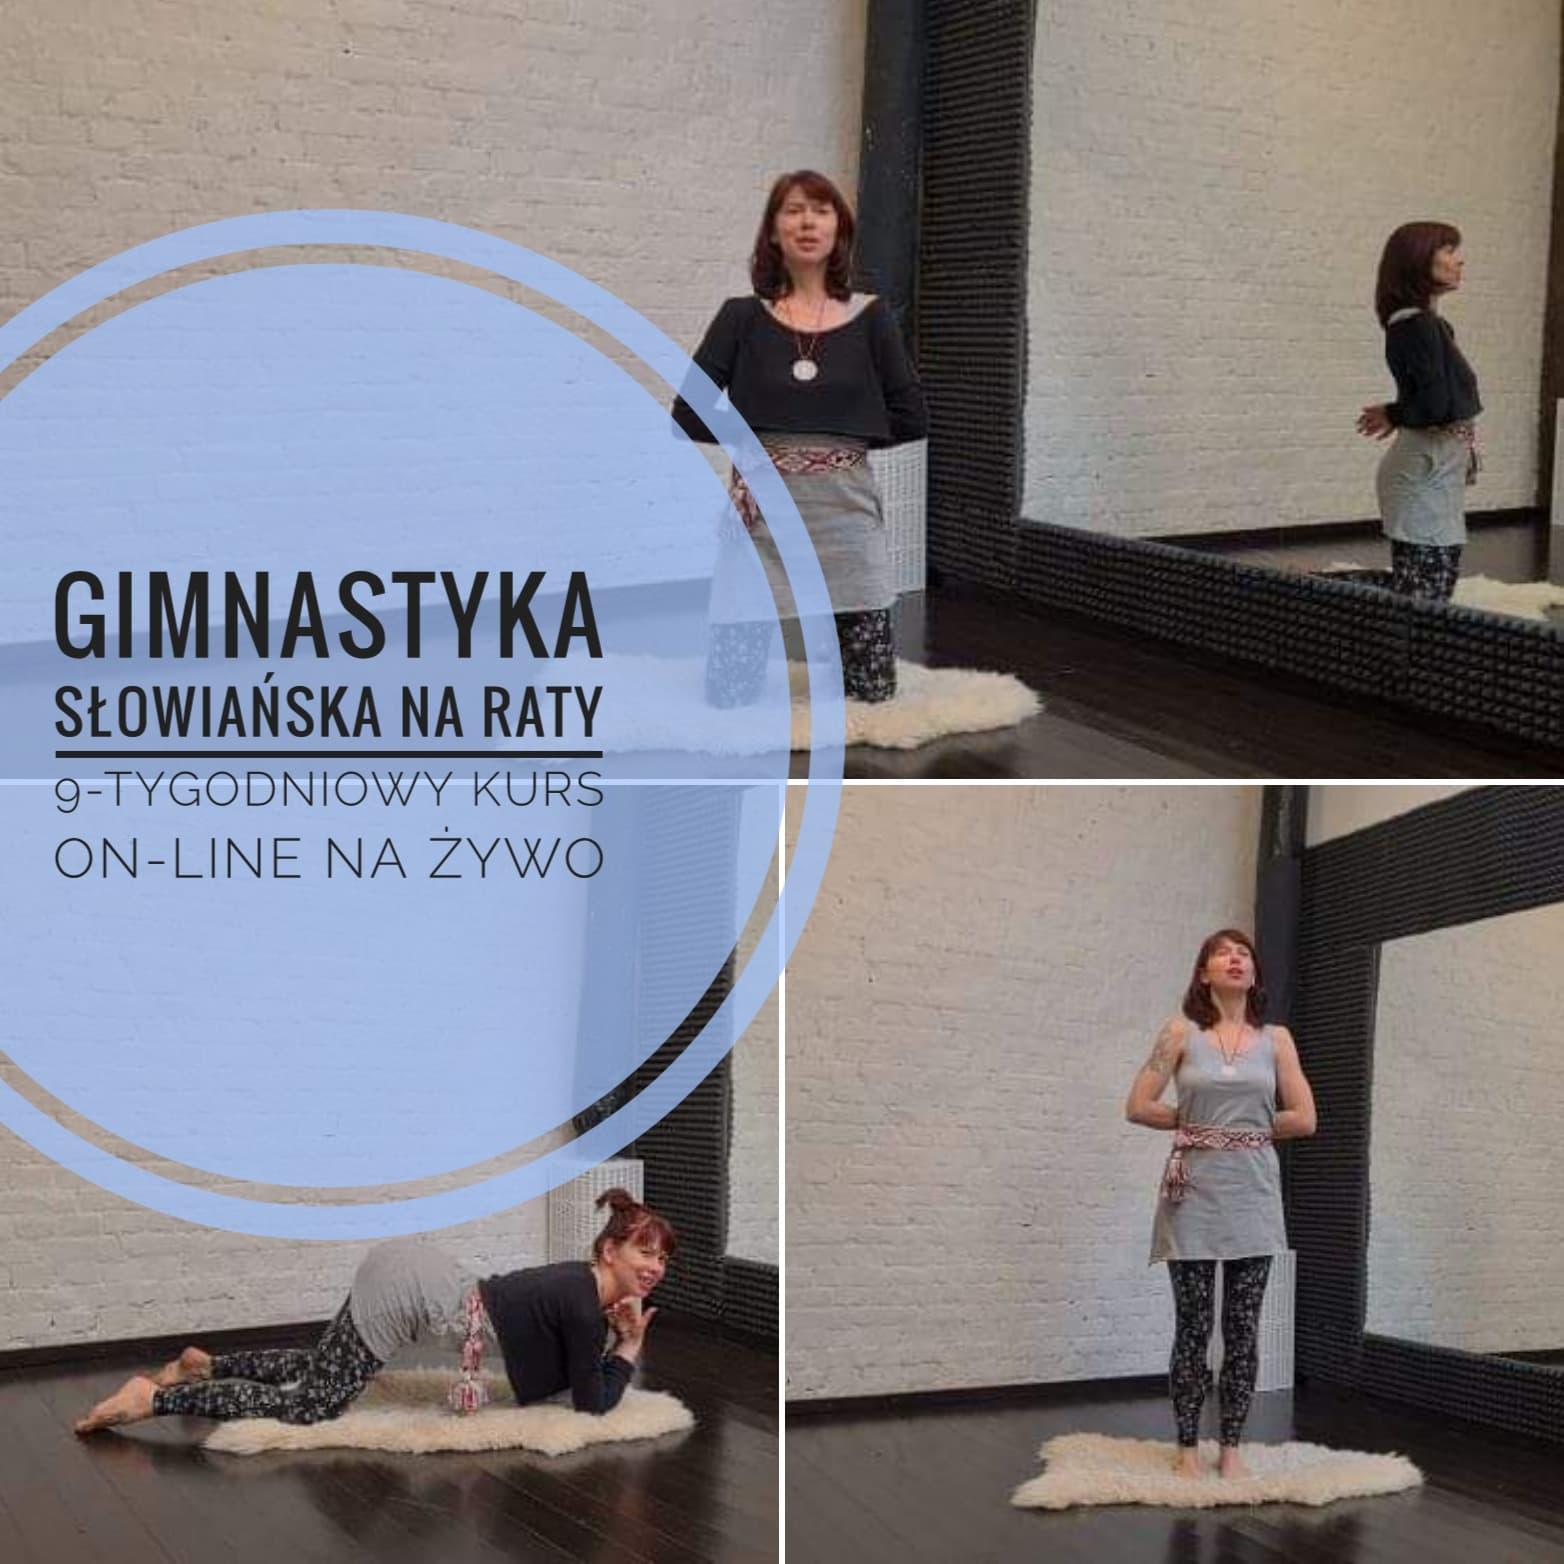 GIMNASTYKA SŁOWIAŃSKA NA RATY (Kurs I stopnia)